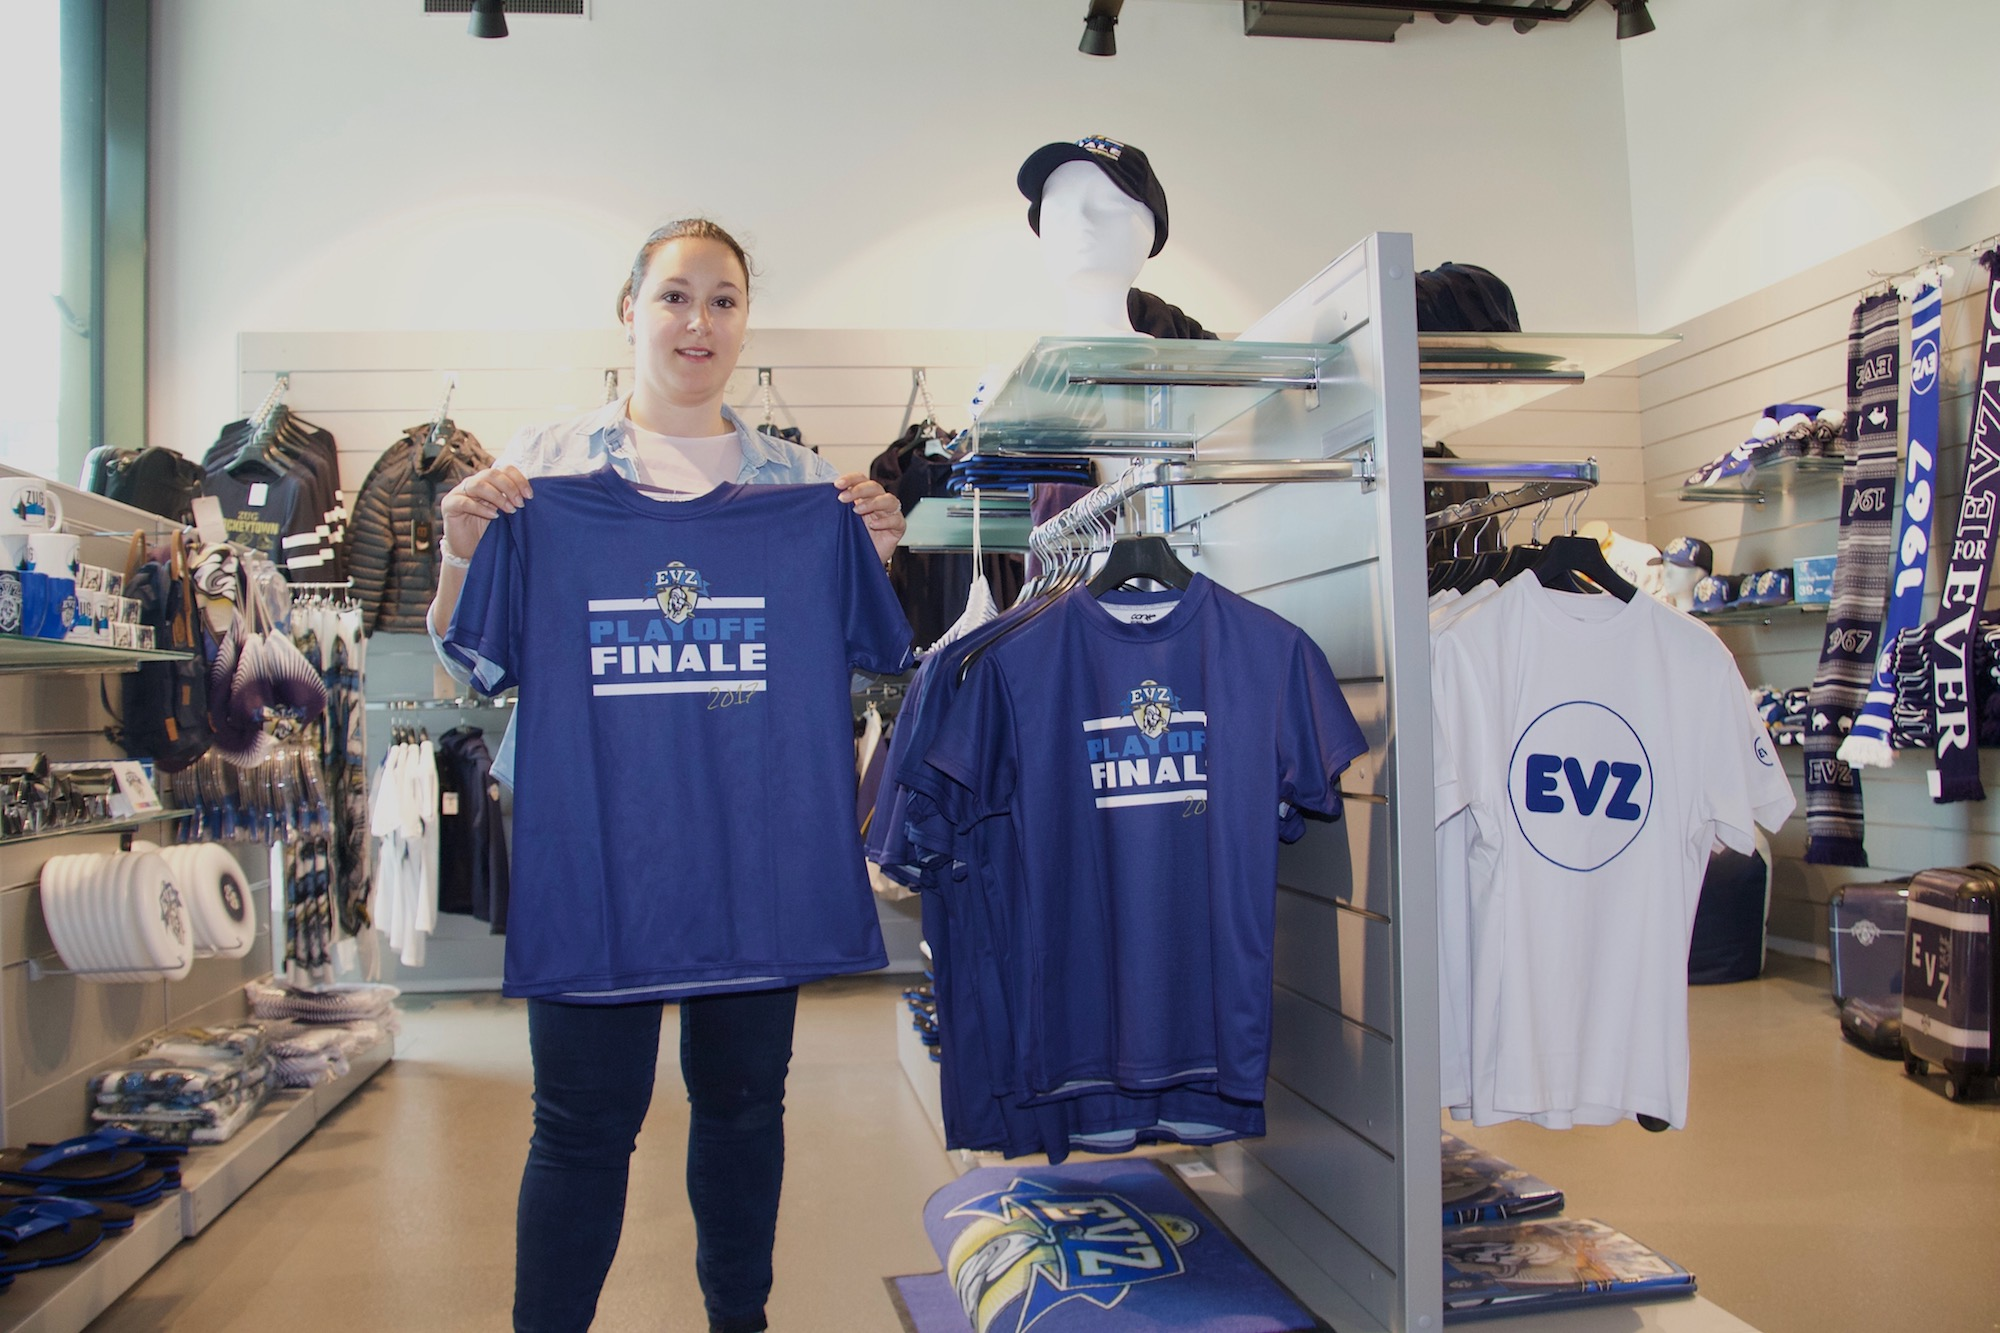 Probiert den Playoff-Top Seller an: zentralplus-Praktikantin und EVZ-Fan Loredana Bevilacqua.